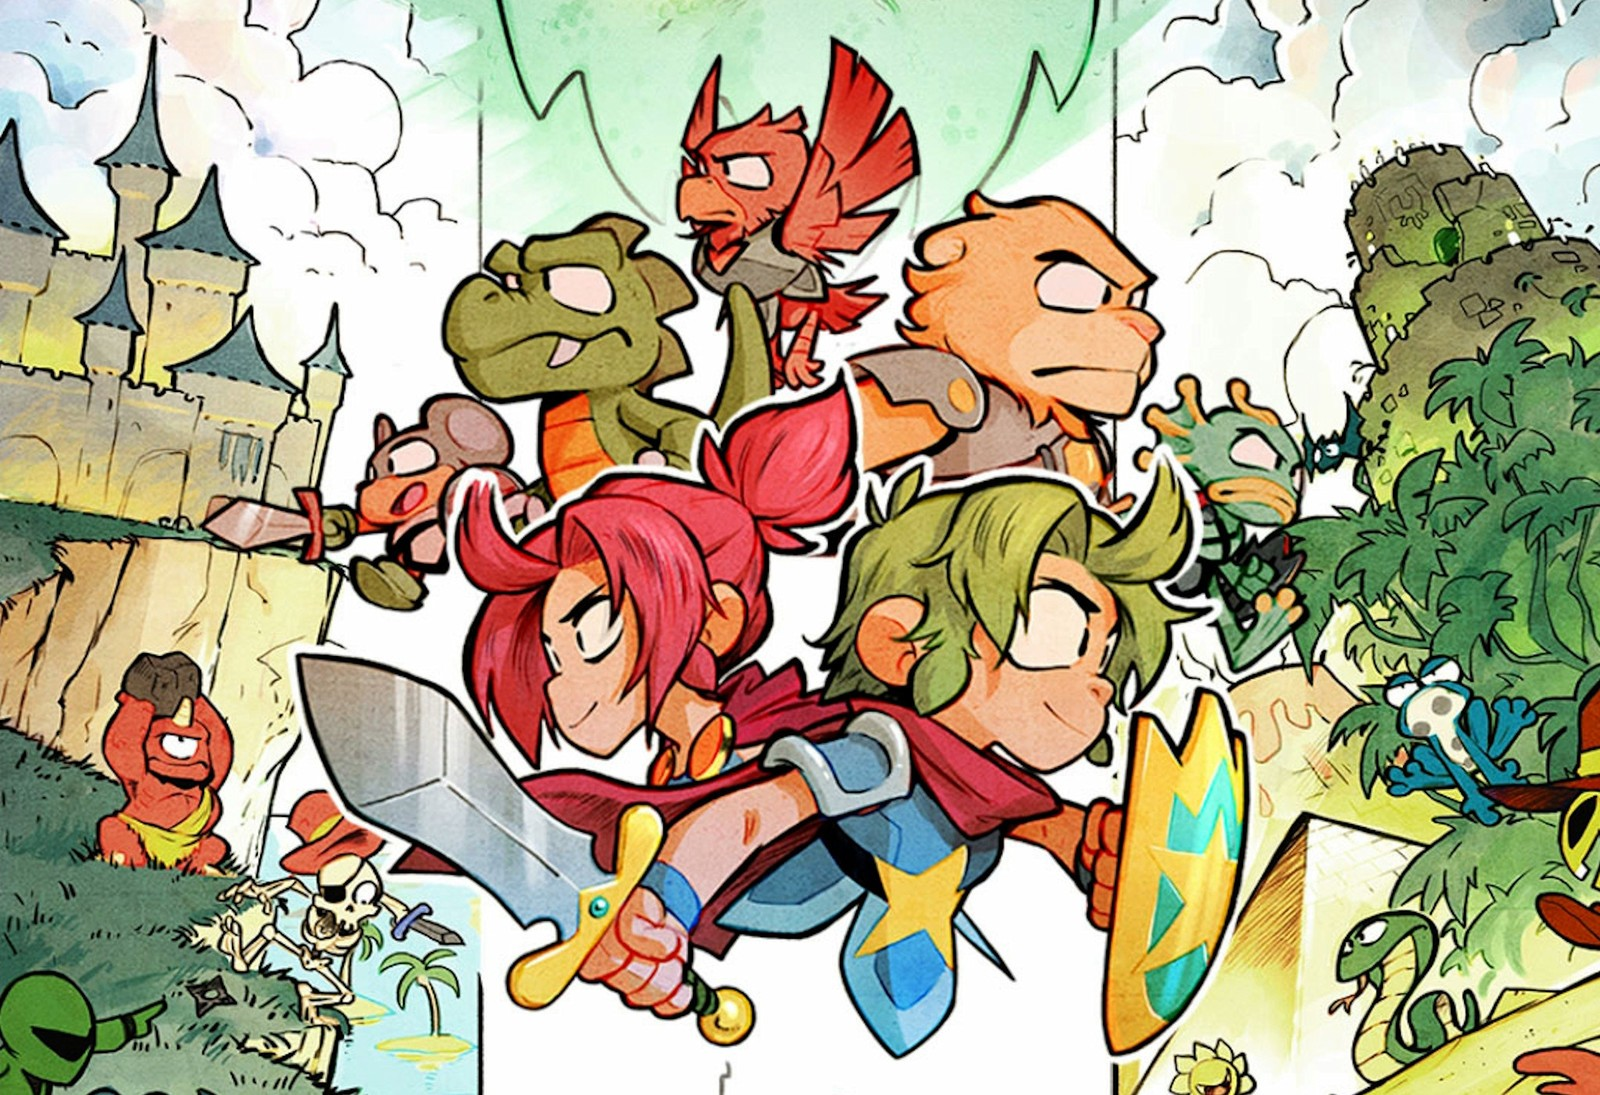 Wonder Boy: The Dragon's Trap vendeu mais de 100 mil unidades no Nintendo Switch